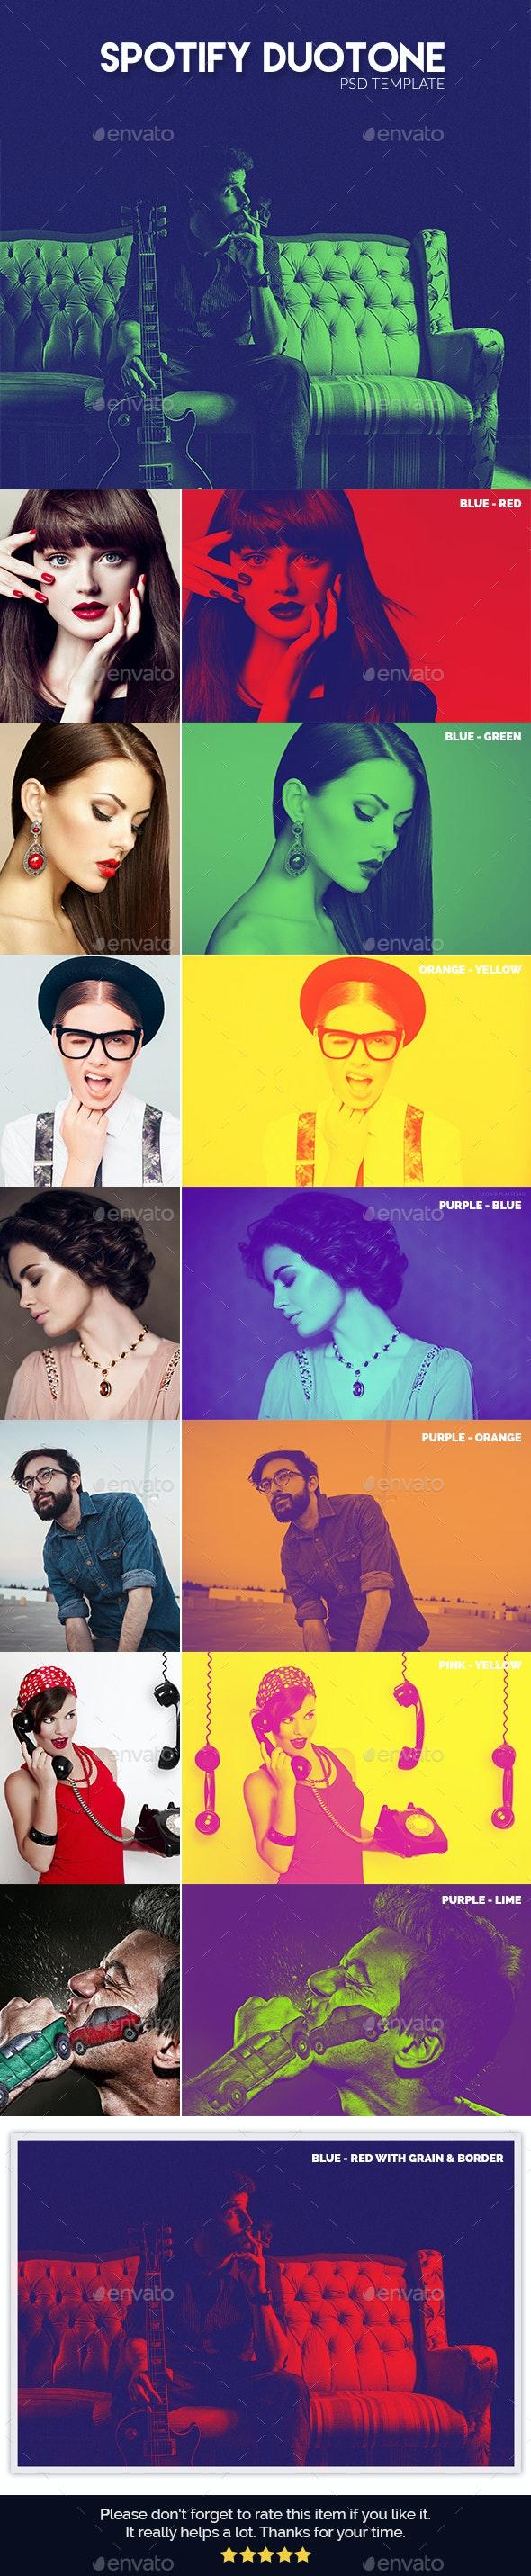 Spotify Duotone Template - Urban Photo Templates